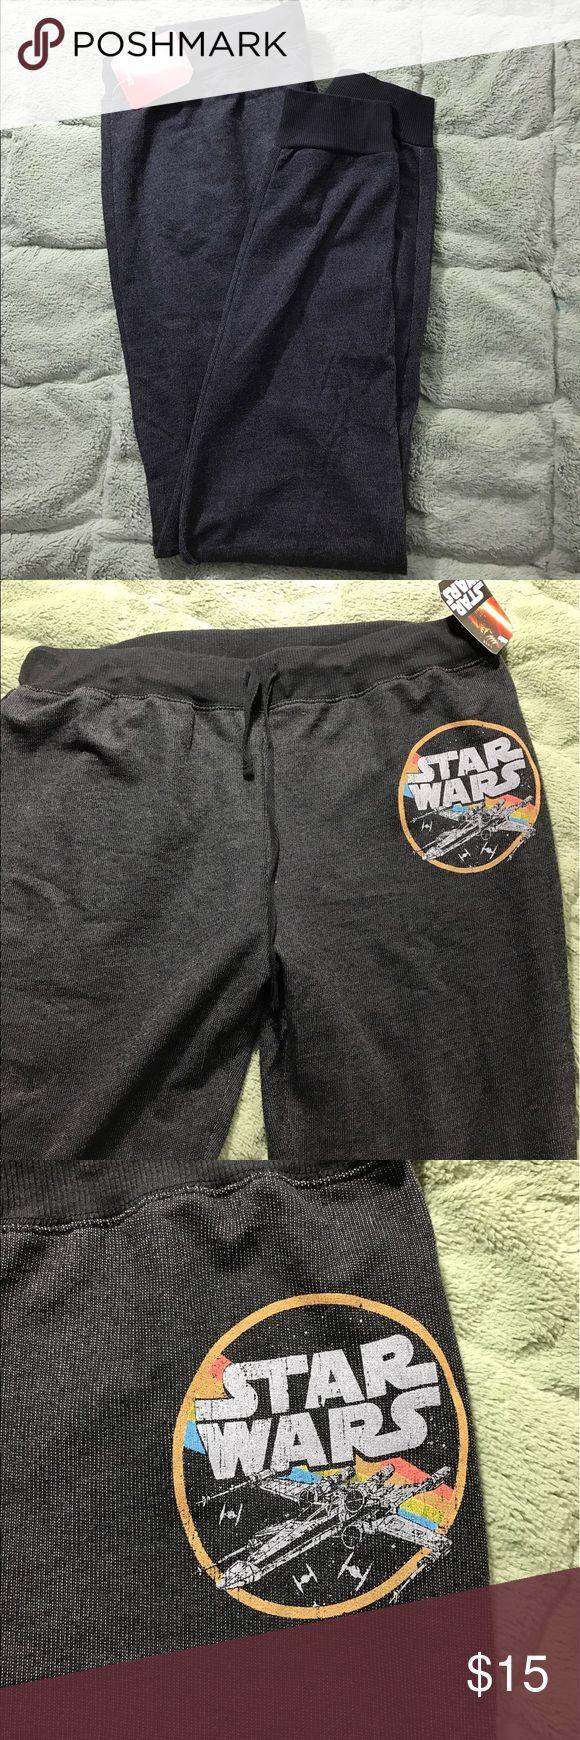 "Disney's Star Wars Women's XL Drawstring Pants Disney's Star Wars Women's XL Drawstring Print Sweatpants - see pictures for details  Waist - 32"" Inseam - 31""  Inventory - E149 Star Wars Intimates & Sleepwear Pajamas"